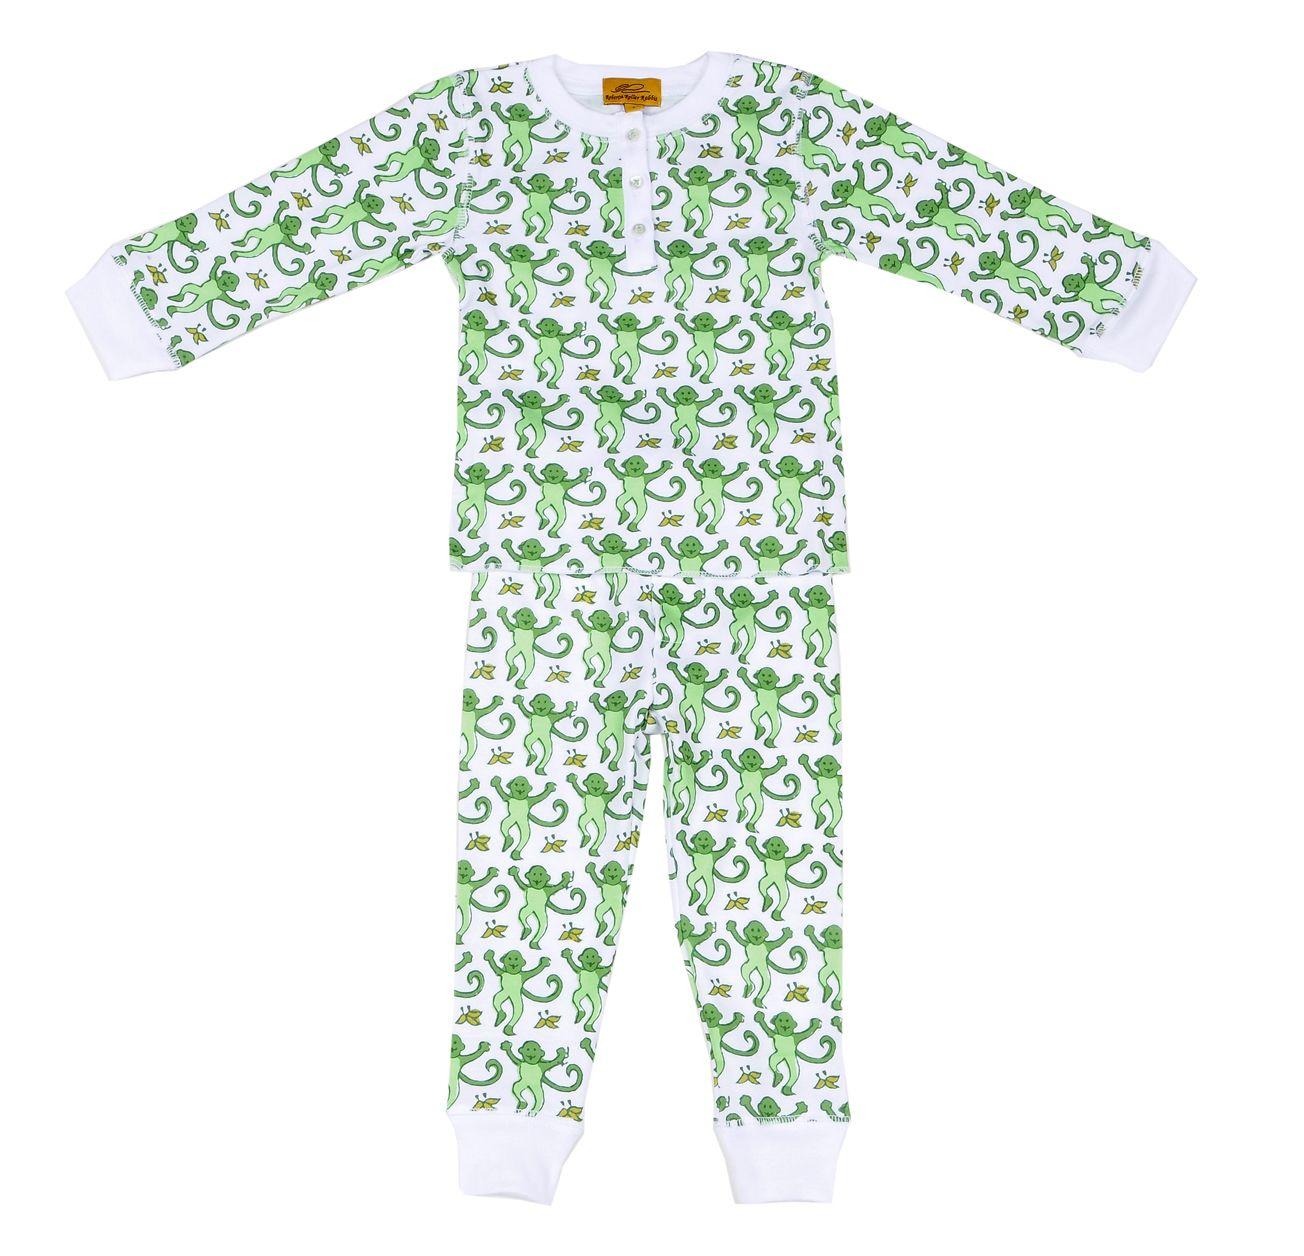 Green Monkey pjs - just for kids!